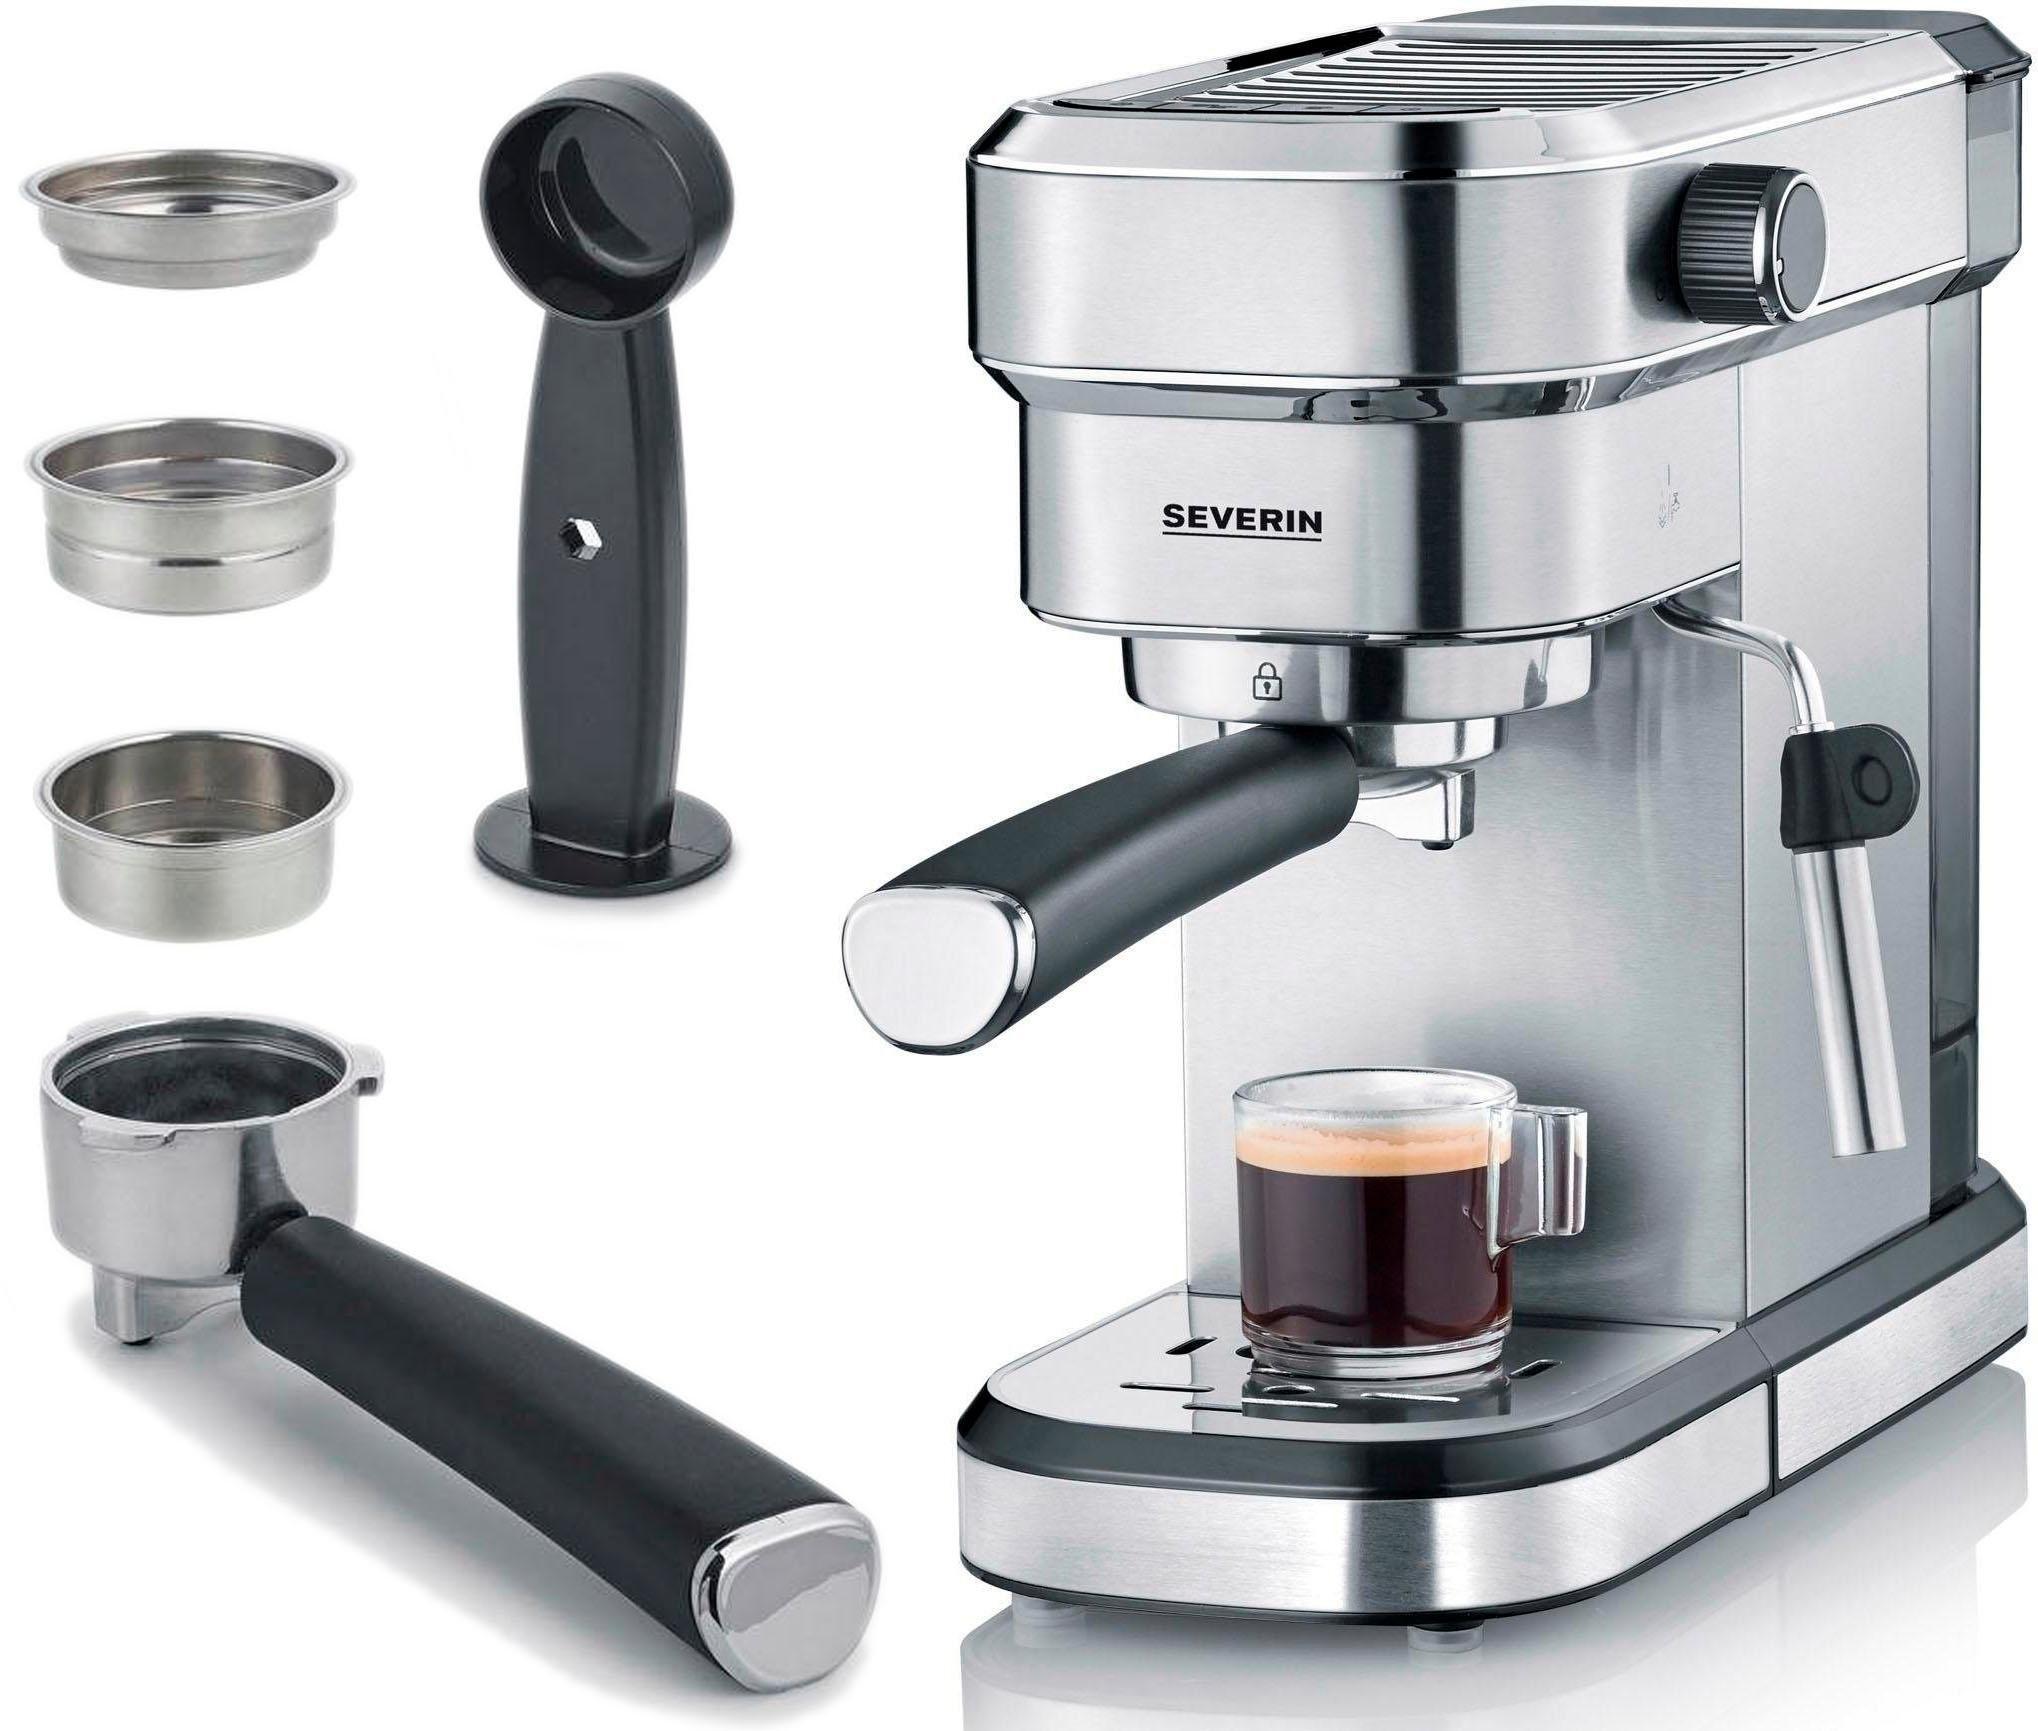 "Severin espressomachine KA 5994 ""Espresa"" bij OTTO online kopen"